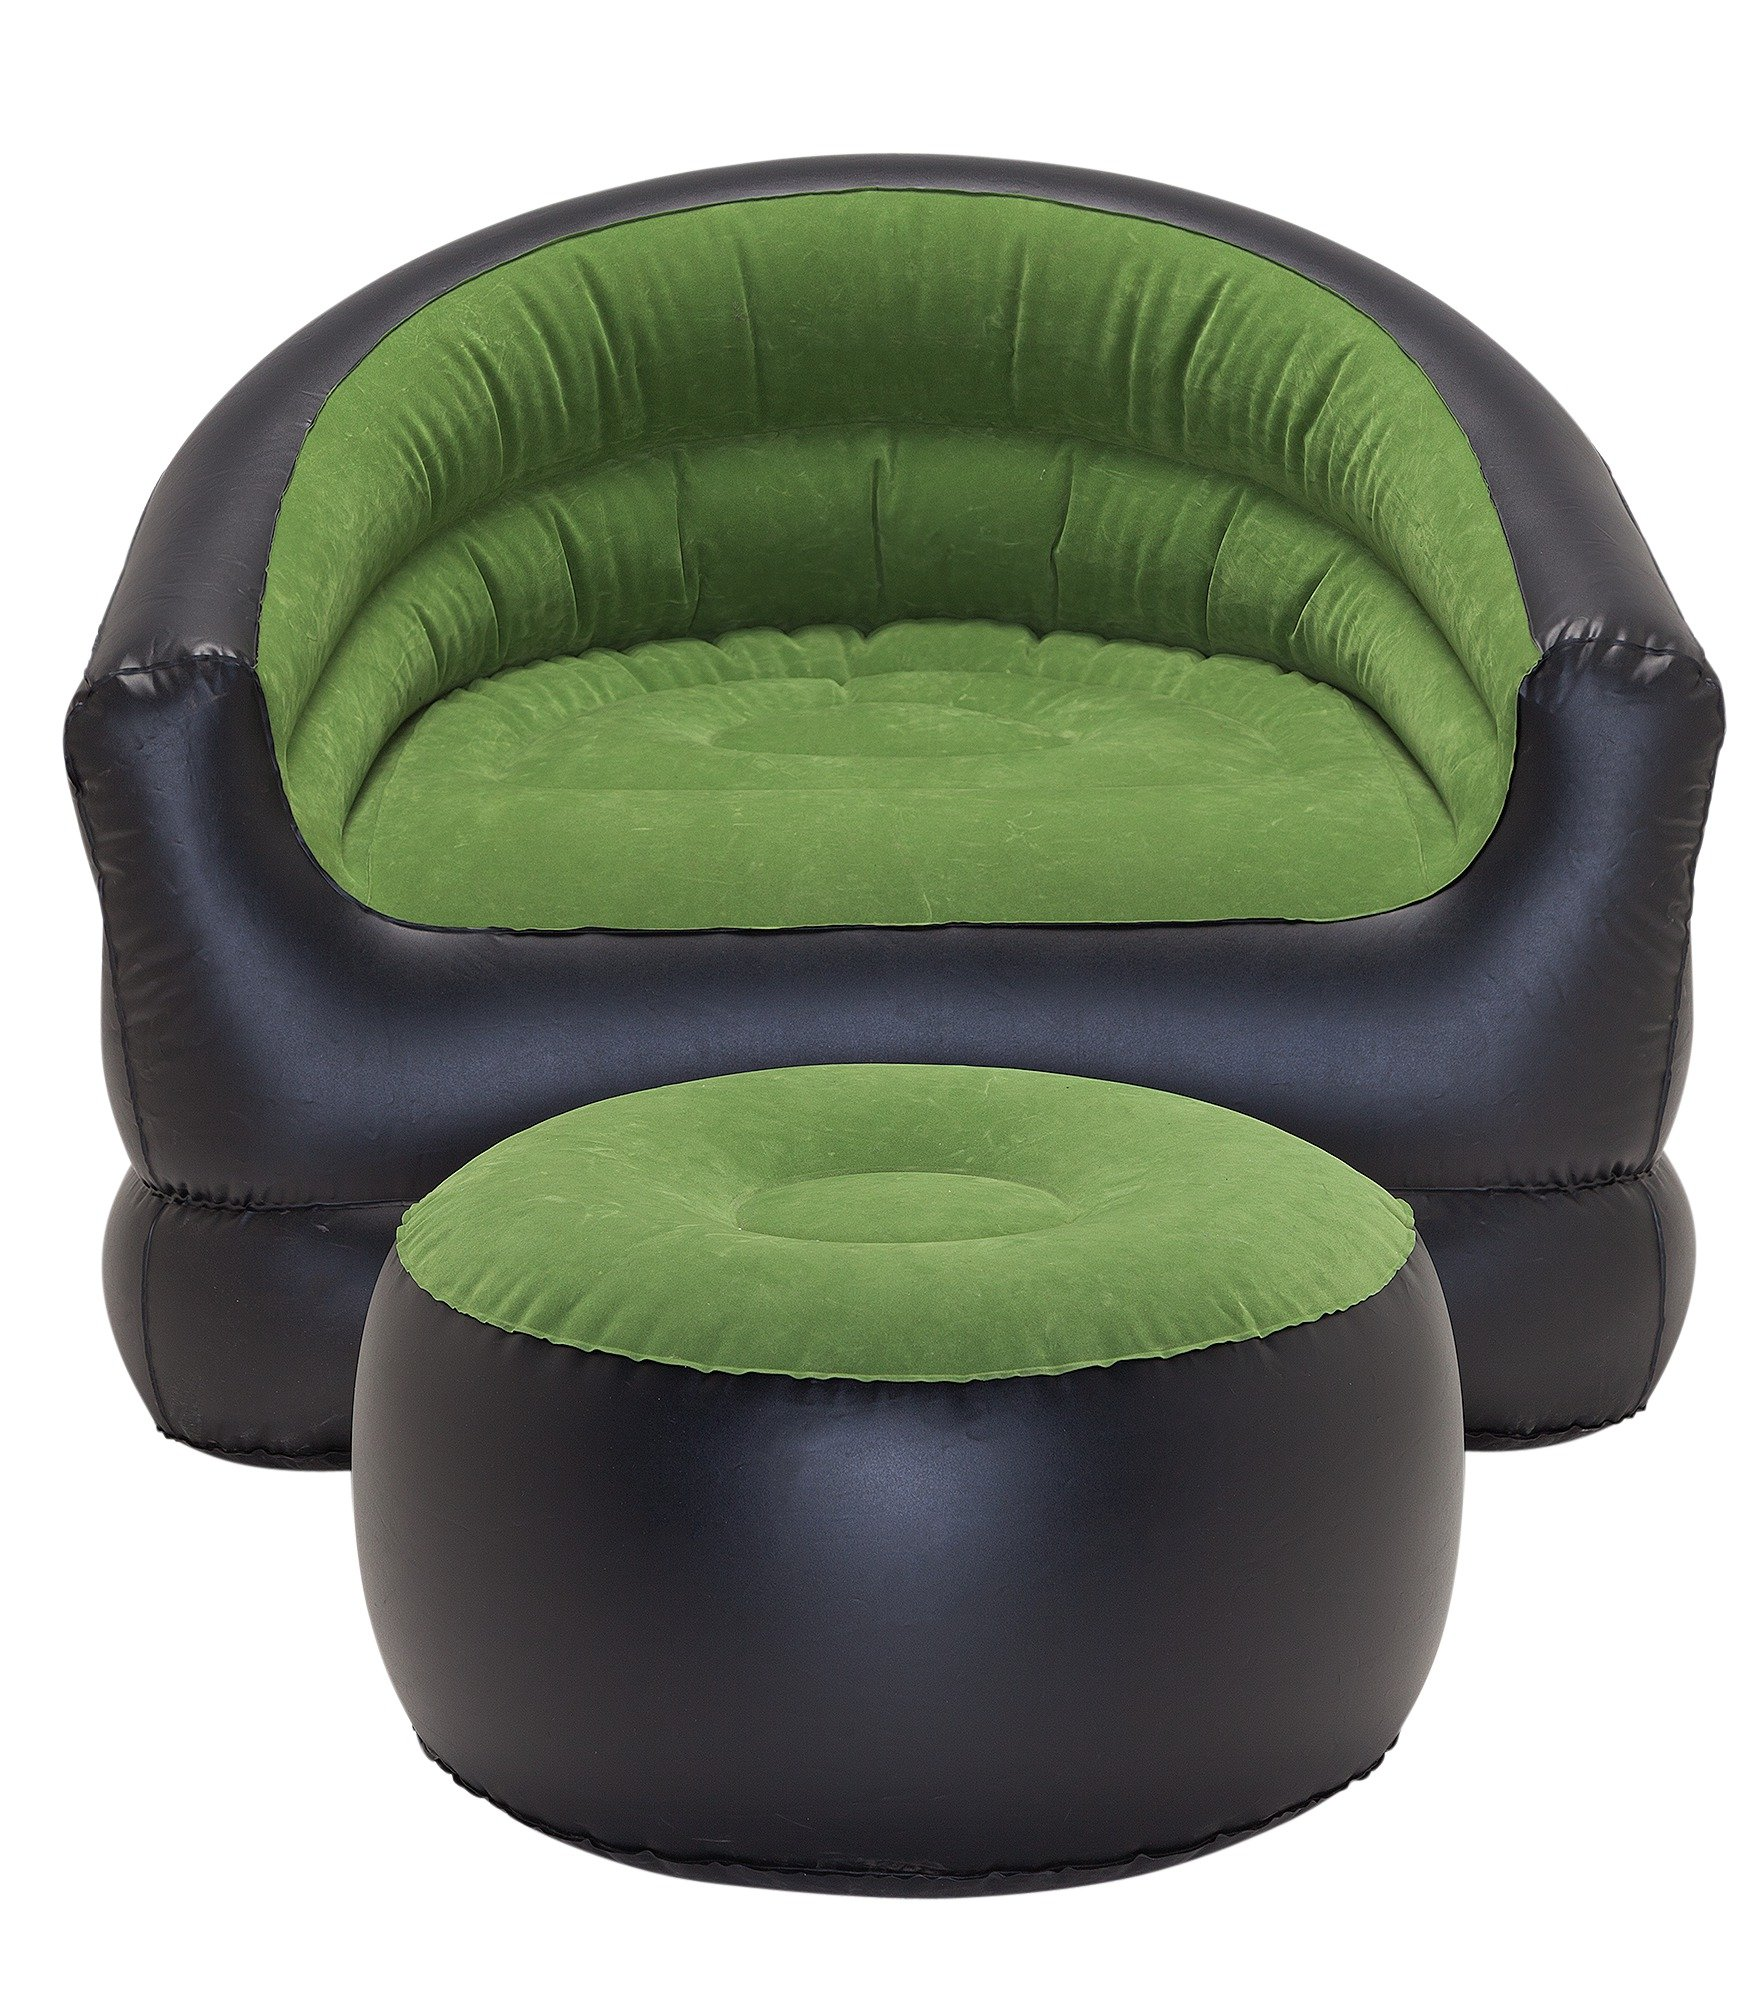 Inflatable Chair Kids Inflatable Chairs Inflatable